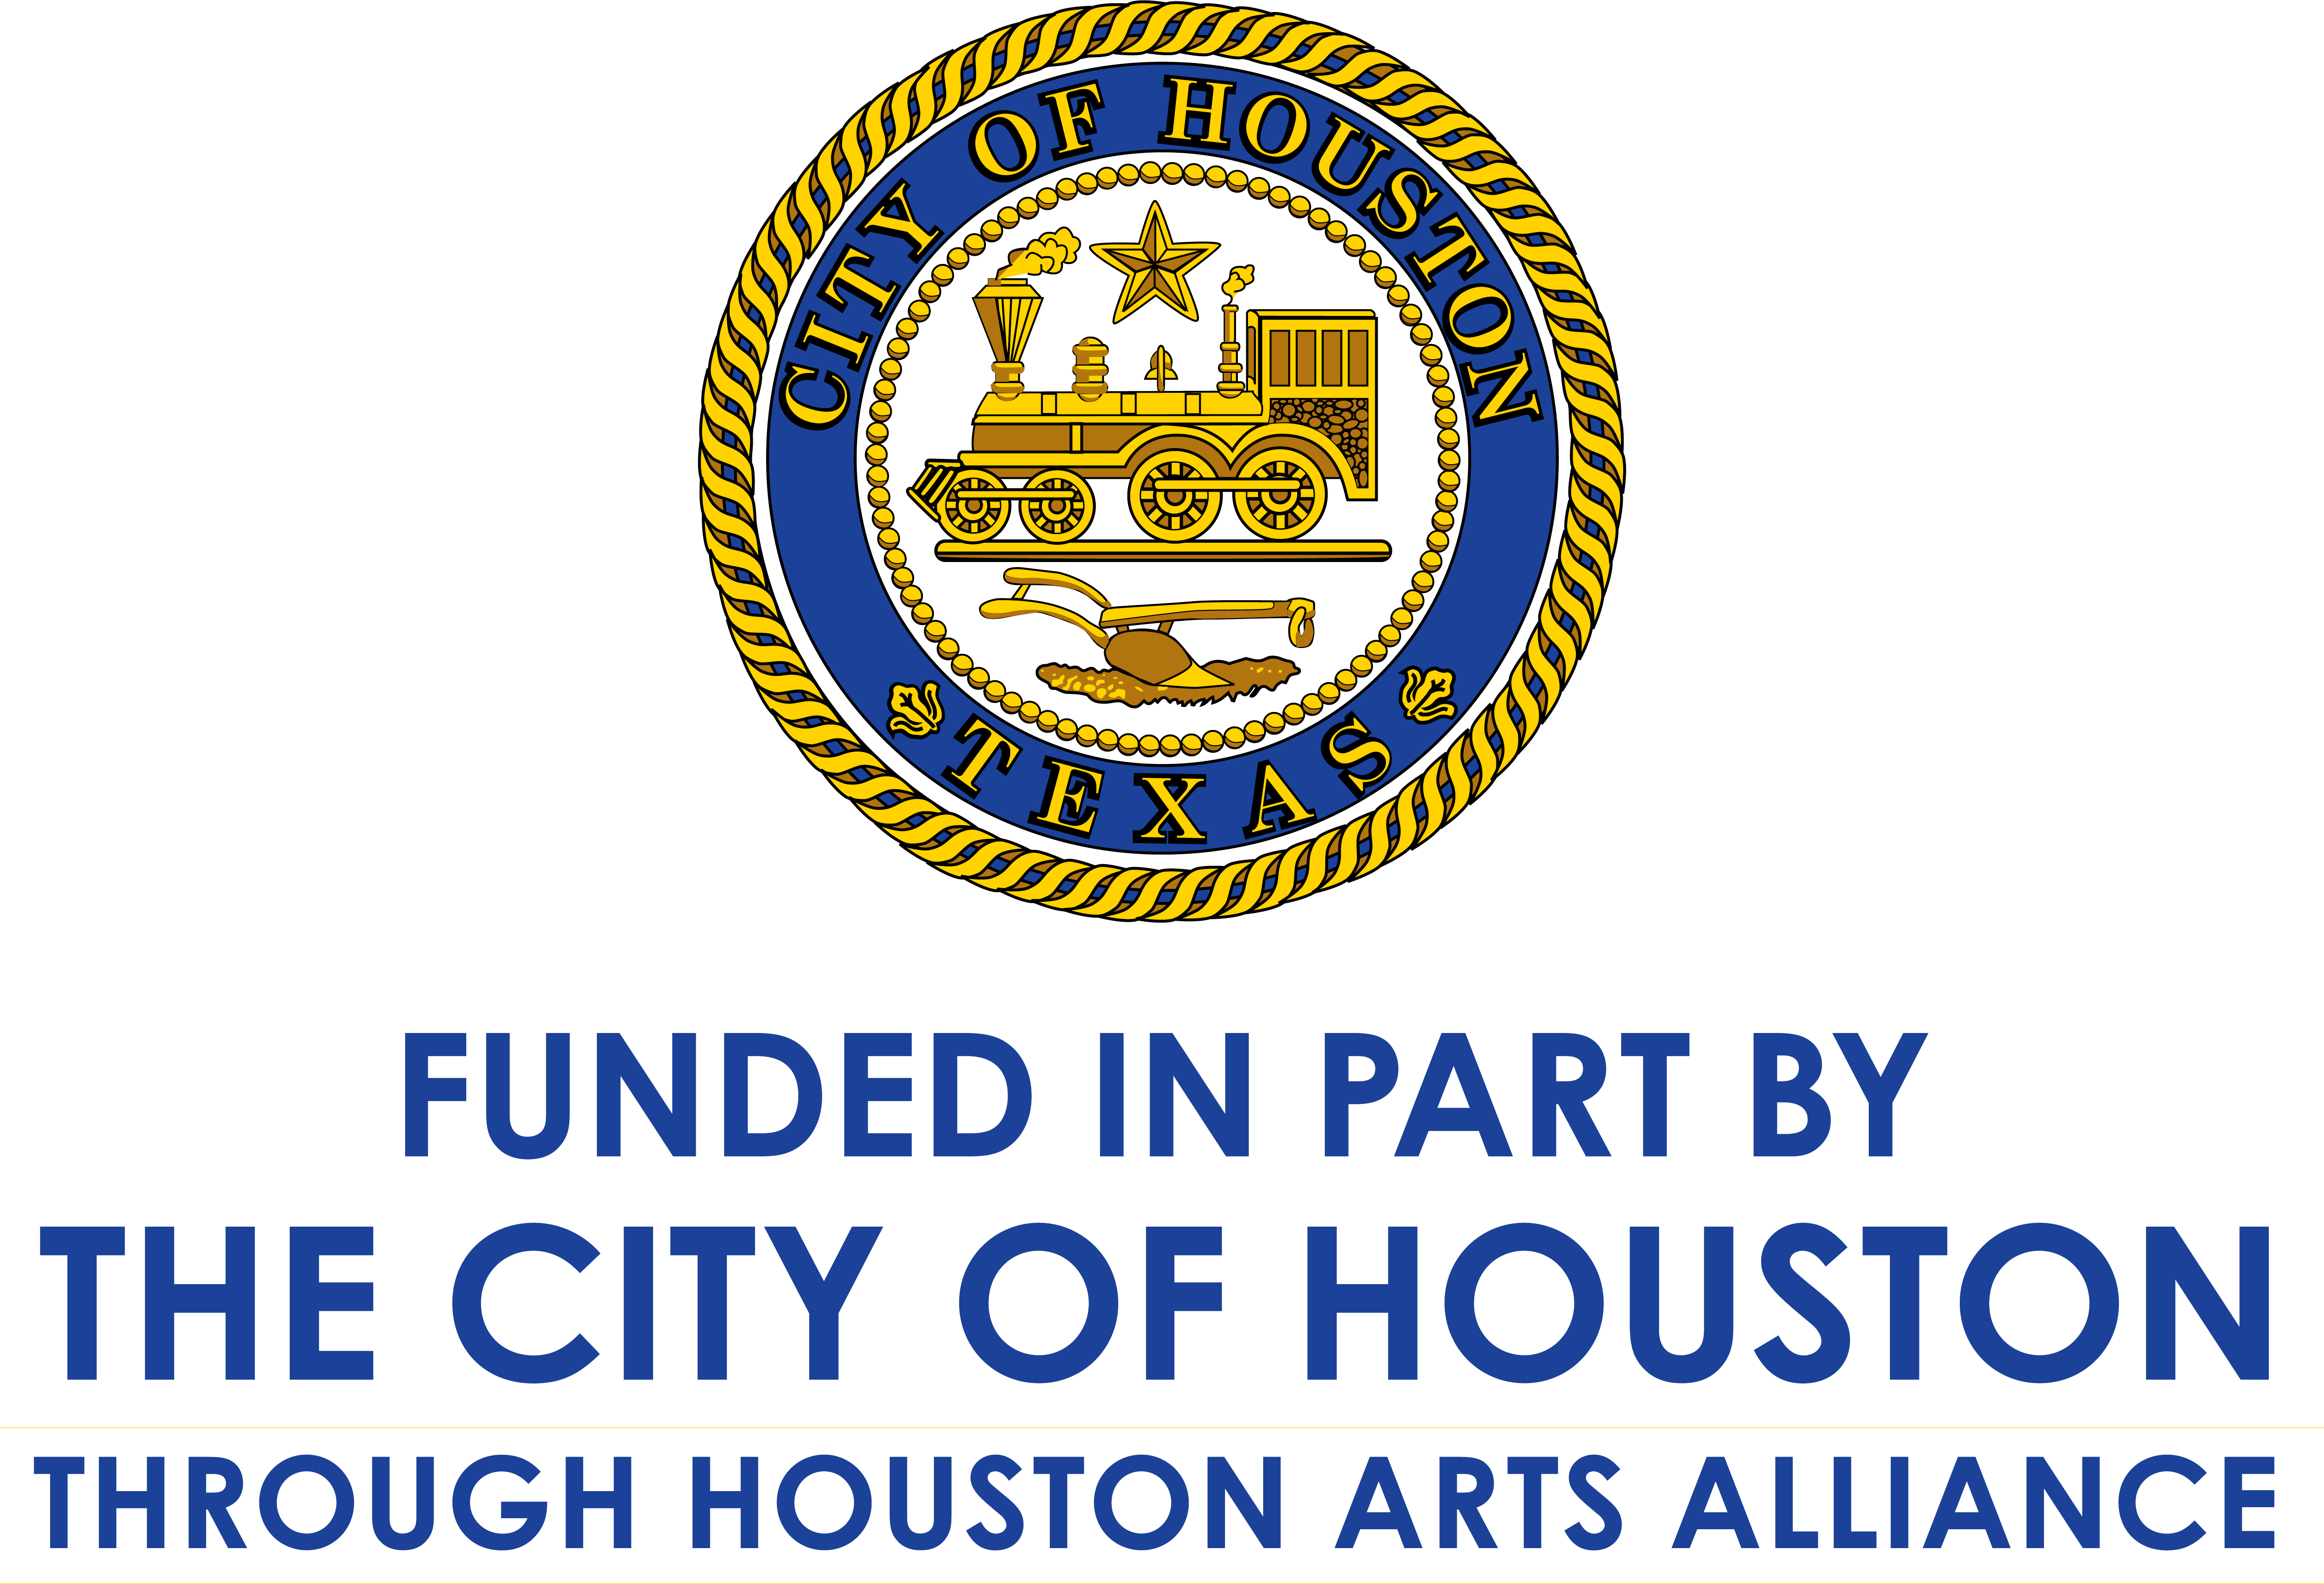 City of Houston funds Riyaaz Qawwali